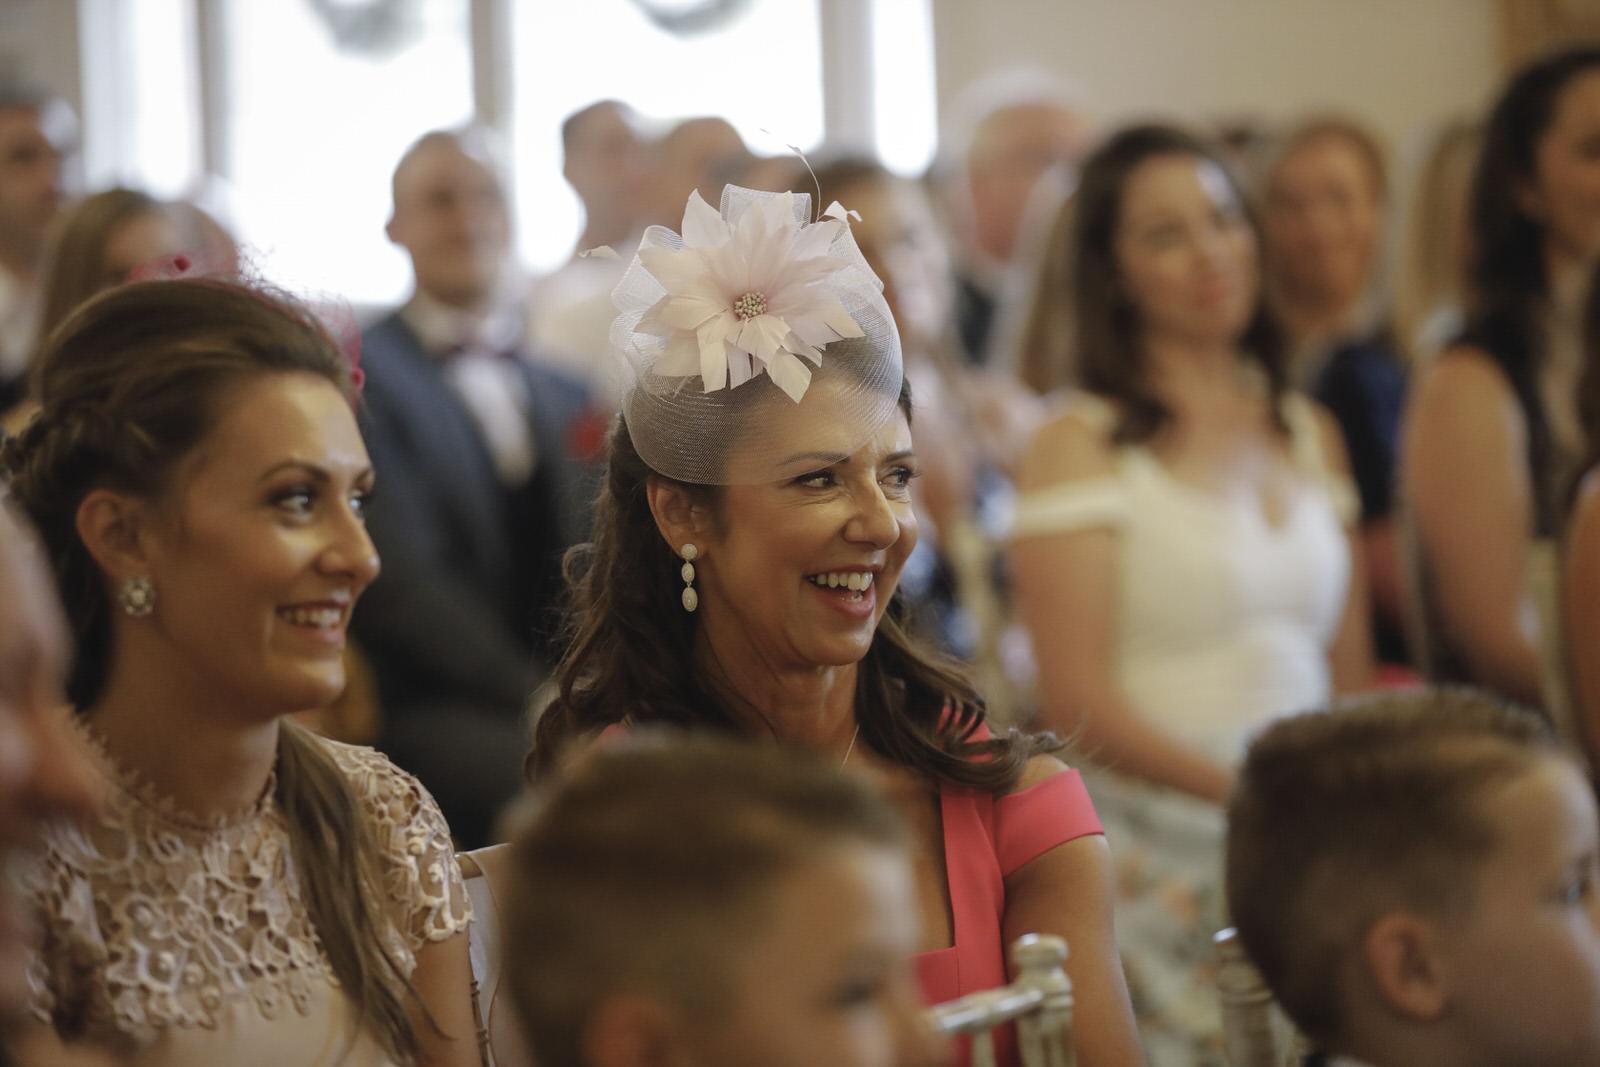 darver_castle_wedding_photographer_goldenmonentsweddingphotography_a230.jpg